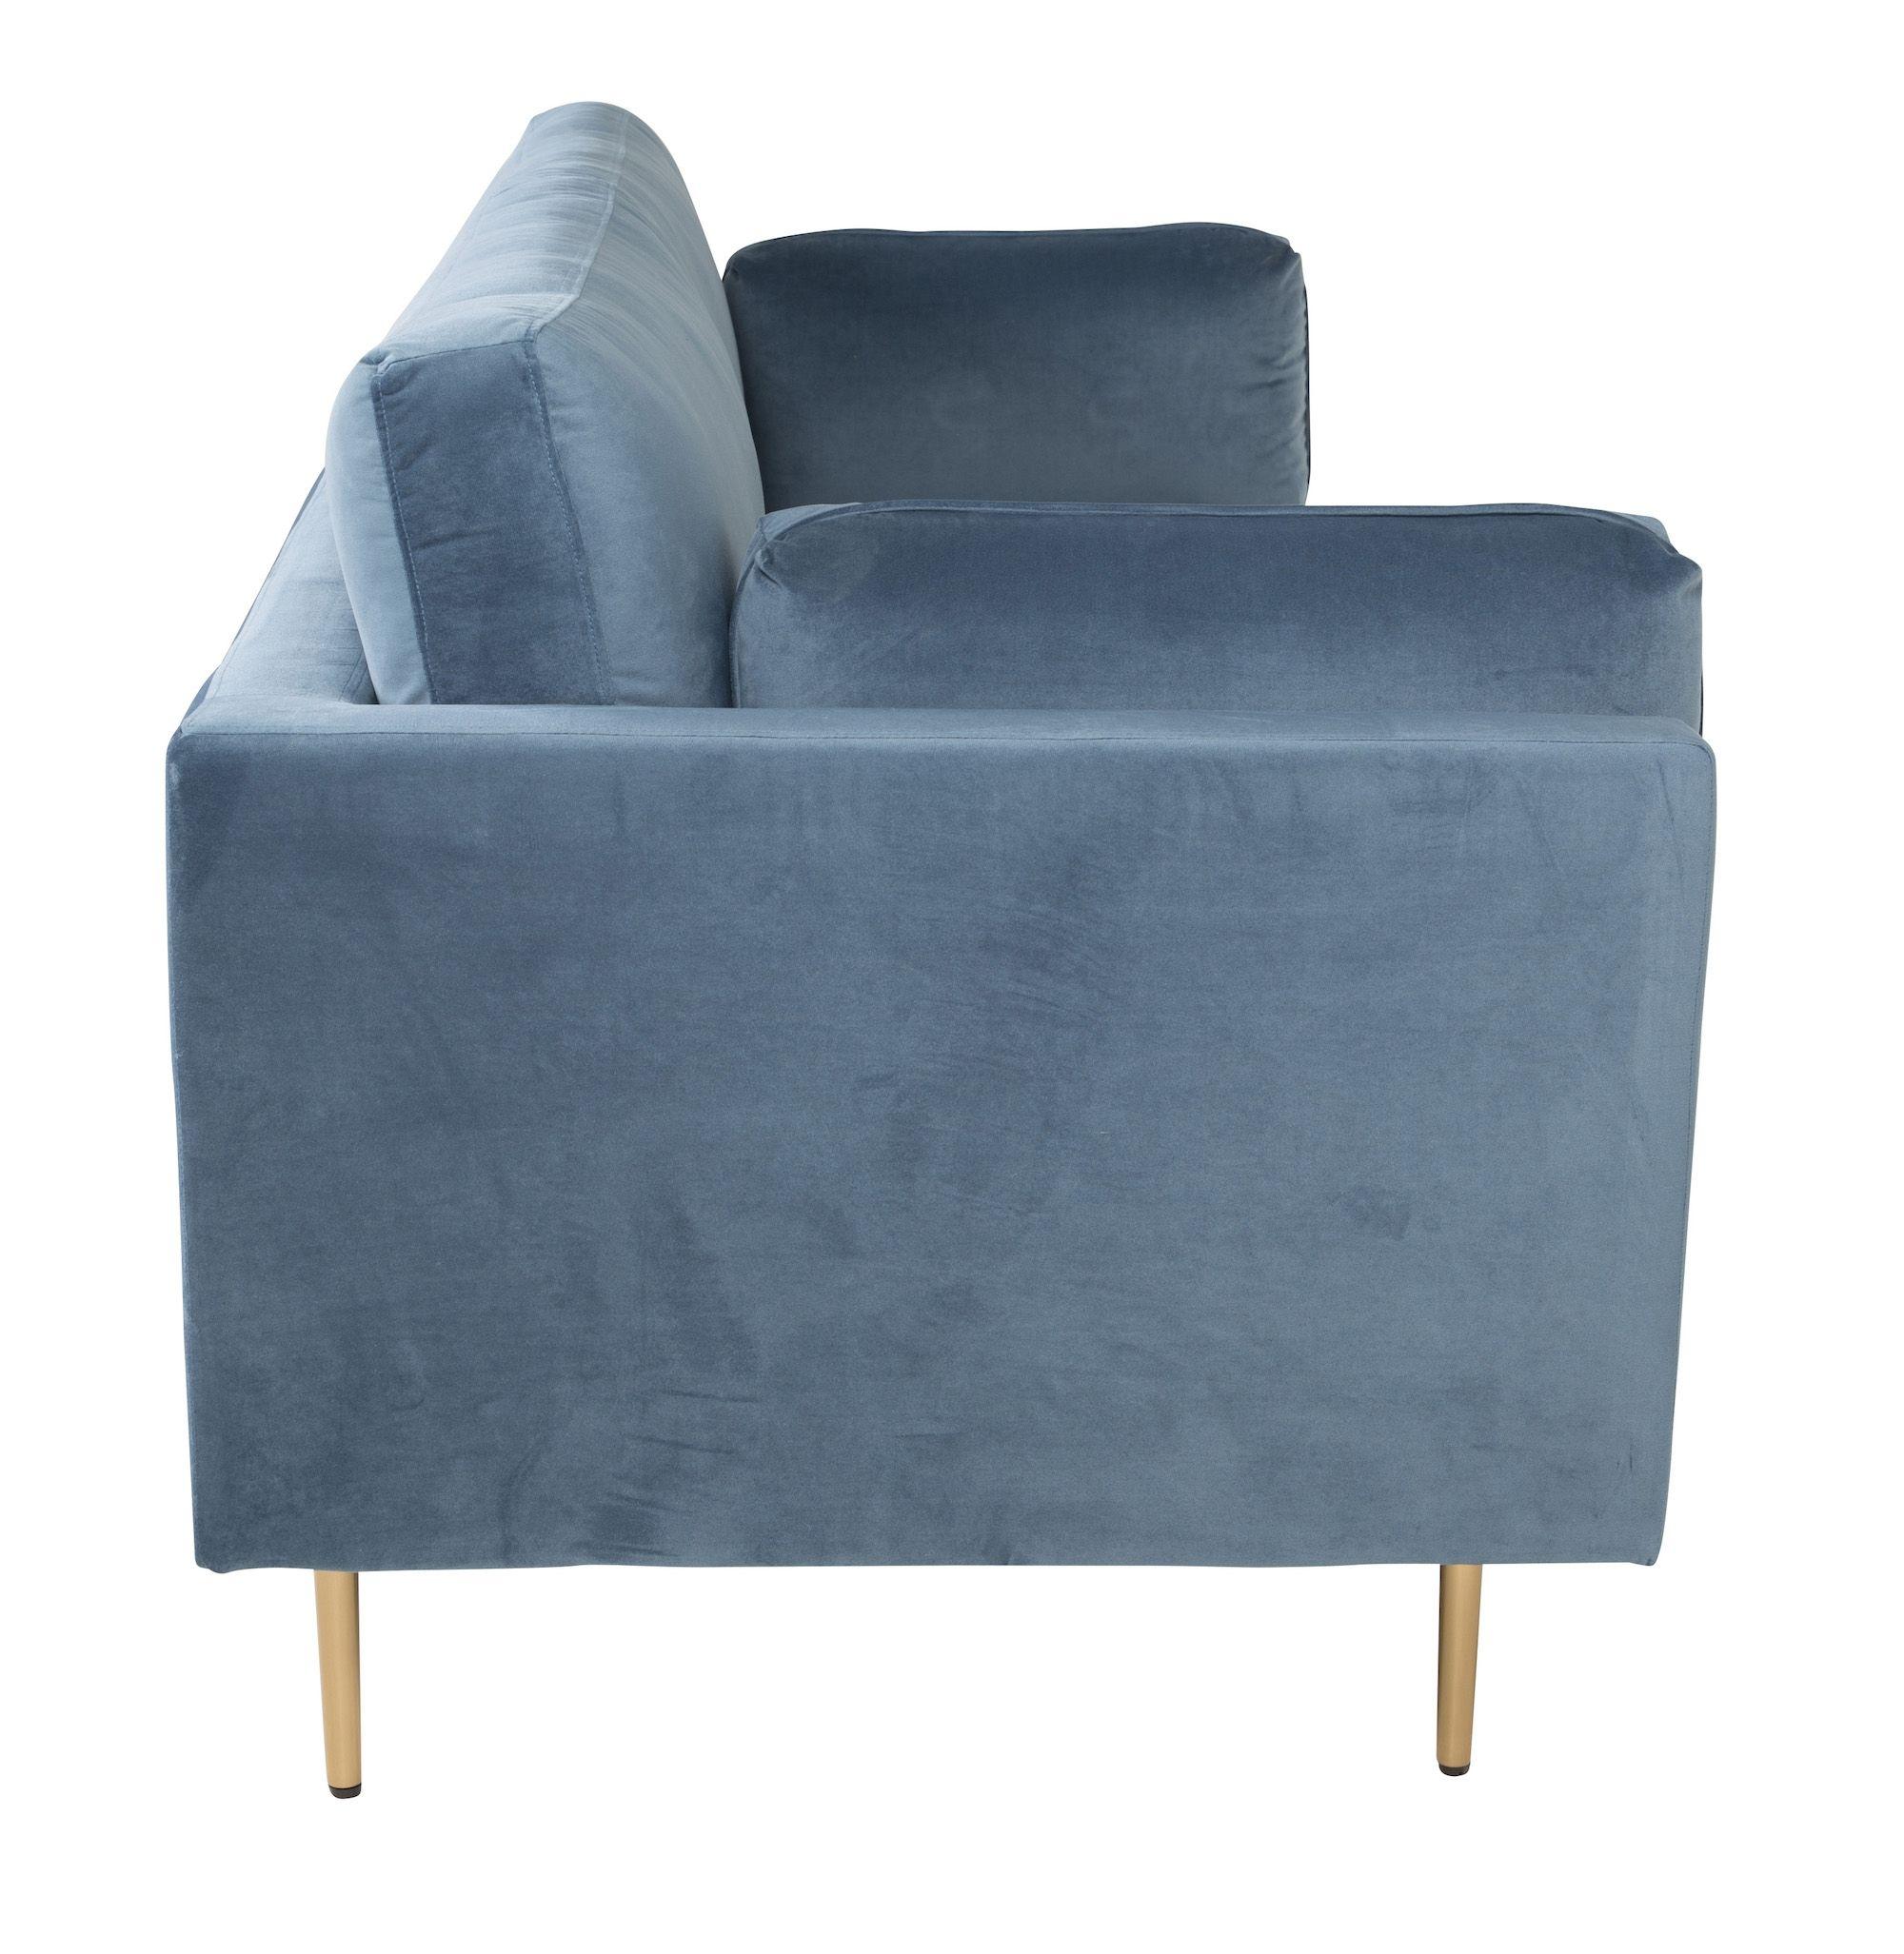 Boom 3-pers. sofa, Blå Velour